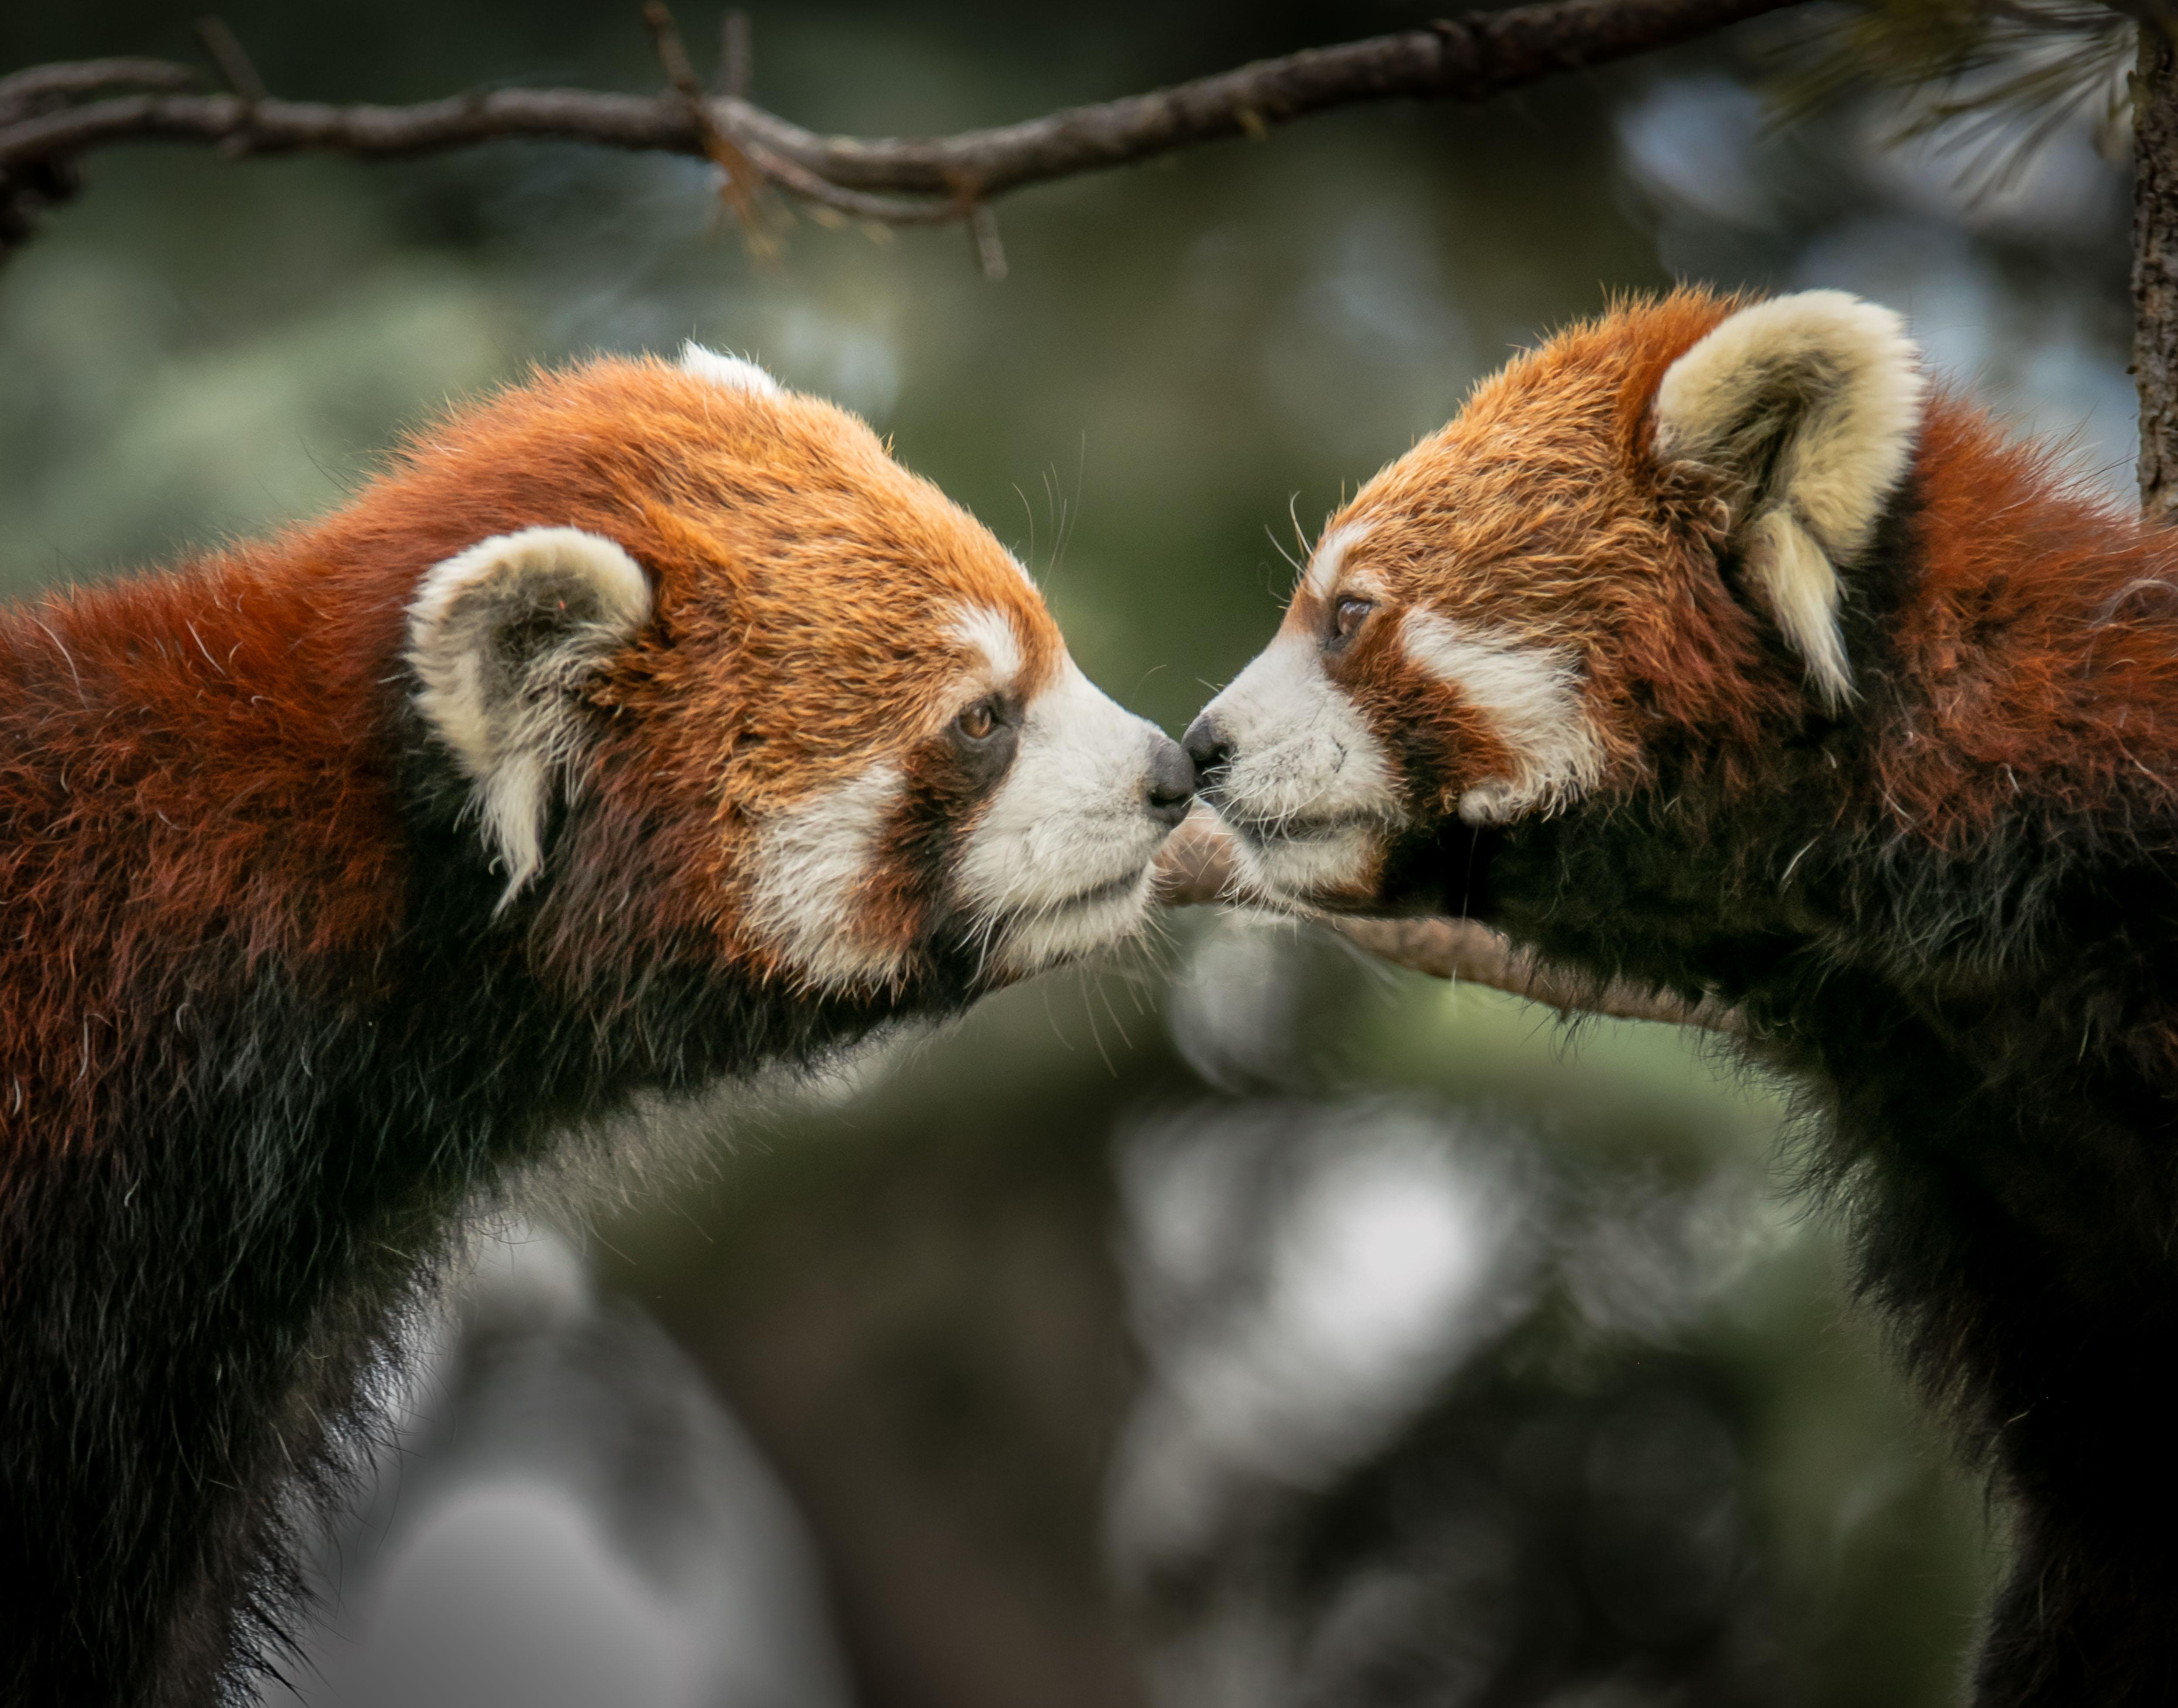 Red Cute Wallpaper Red Panda 183 Free Stock Photo